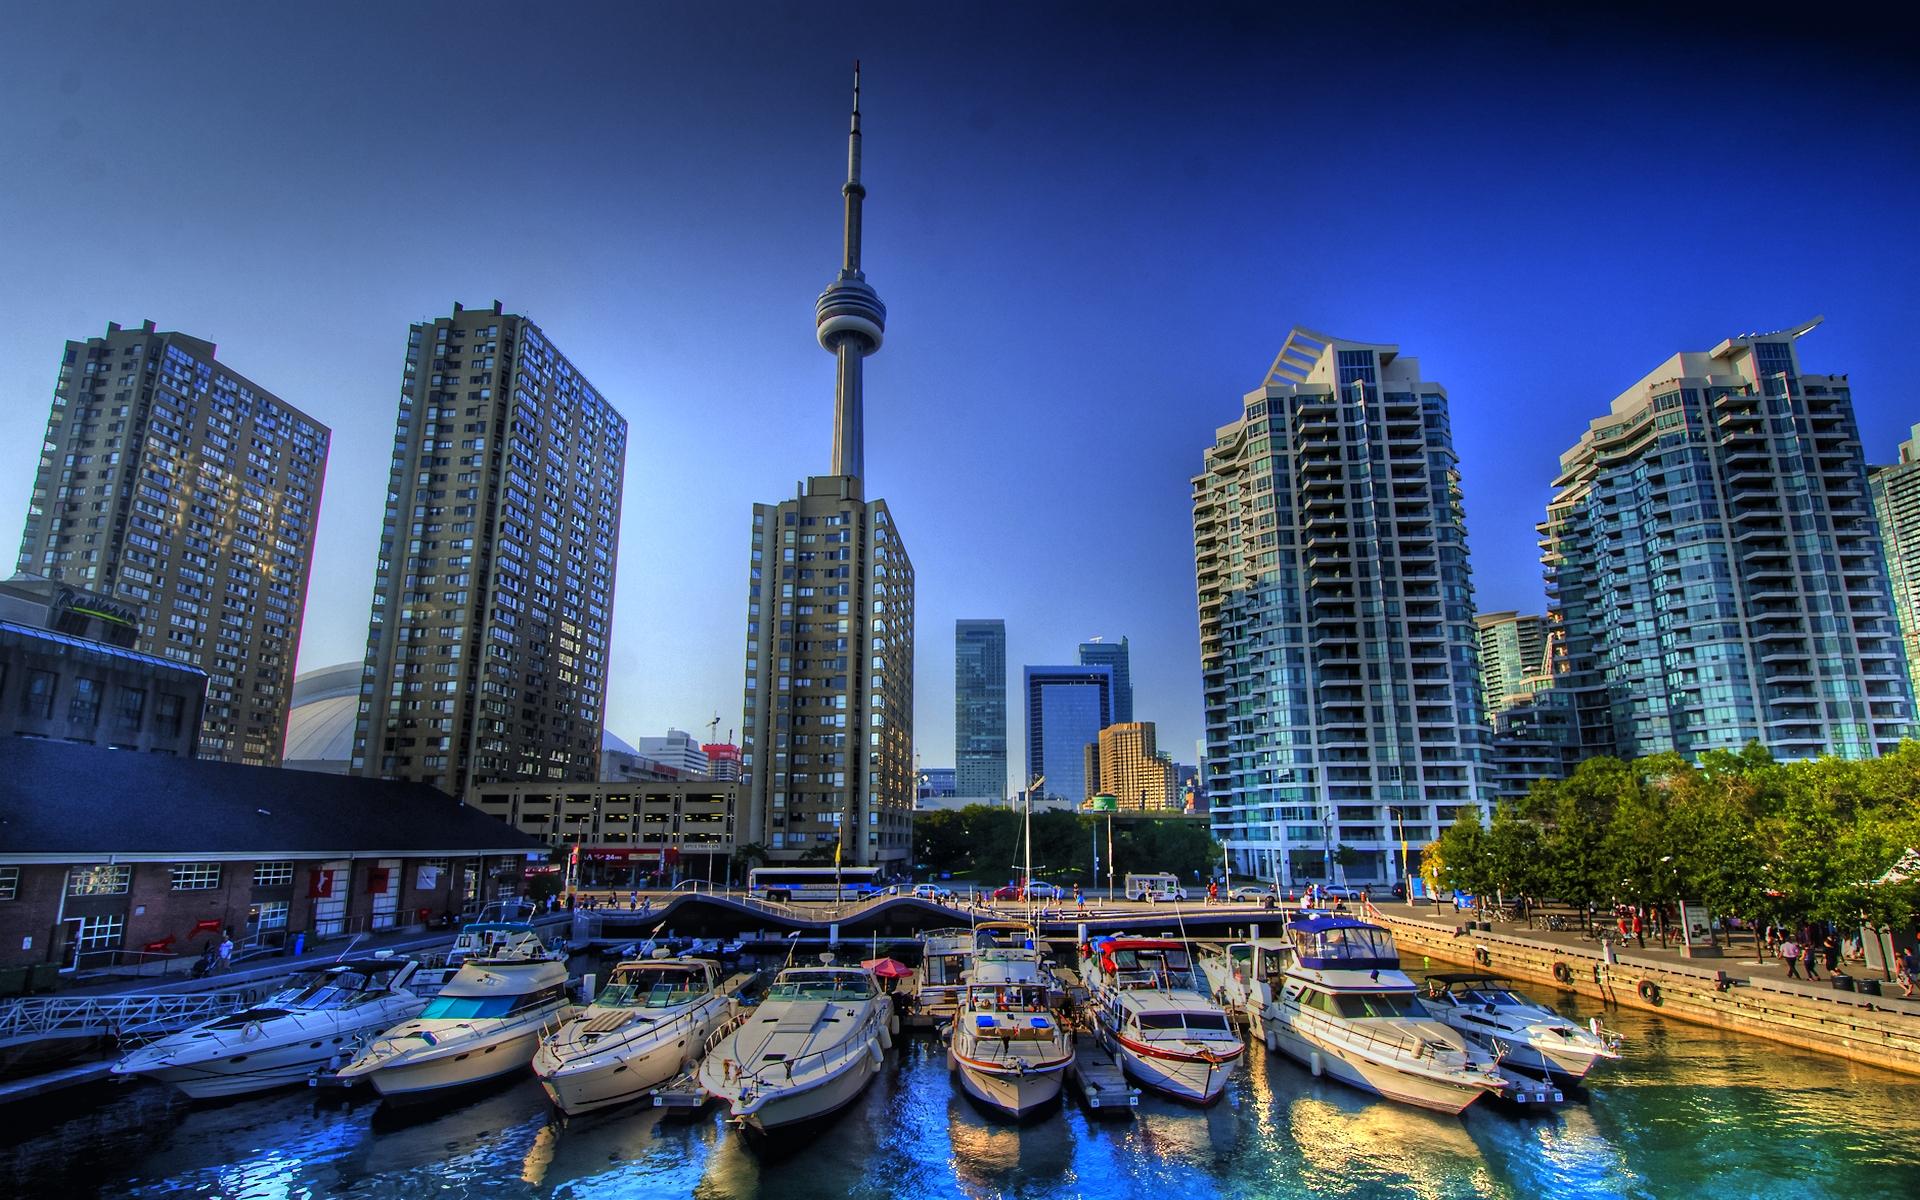 Free Download Hd Hintergrundbilder Canada Wallpaper Hd